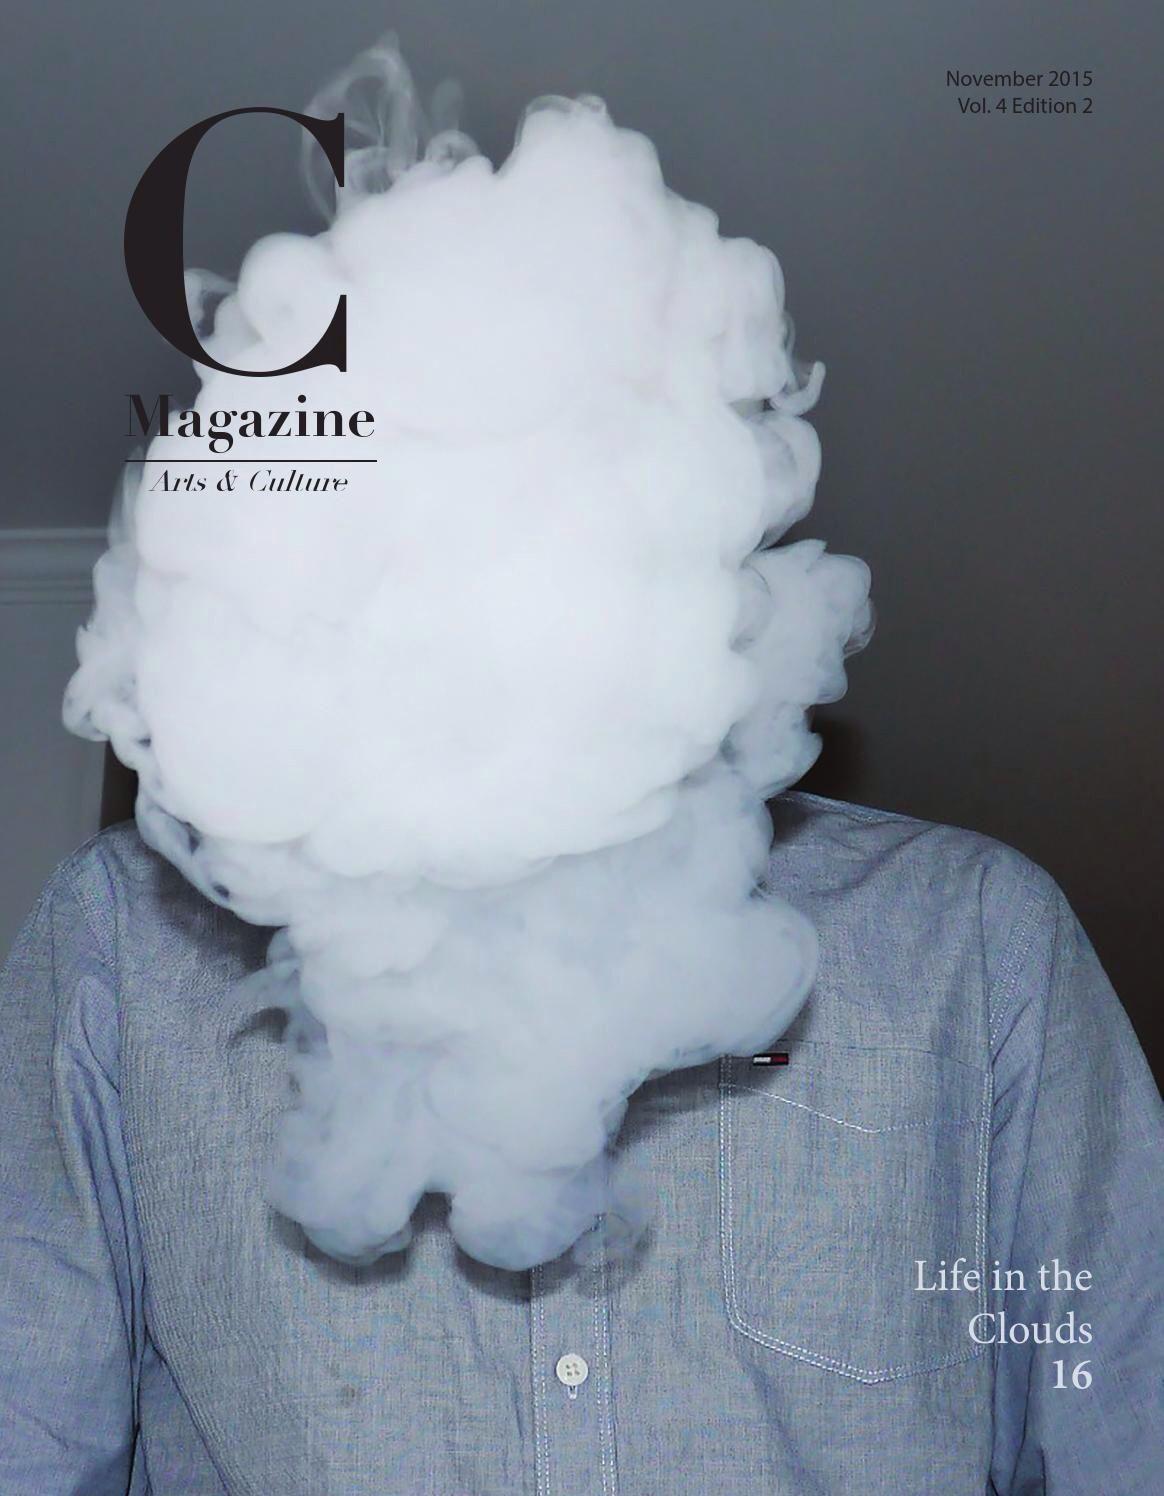 C Magazine Vol. 4 Edition 2